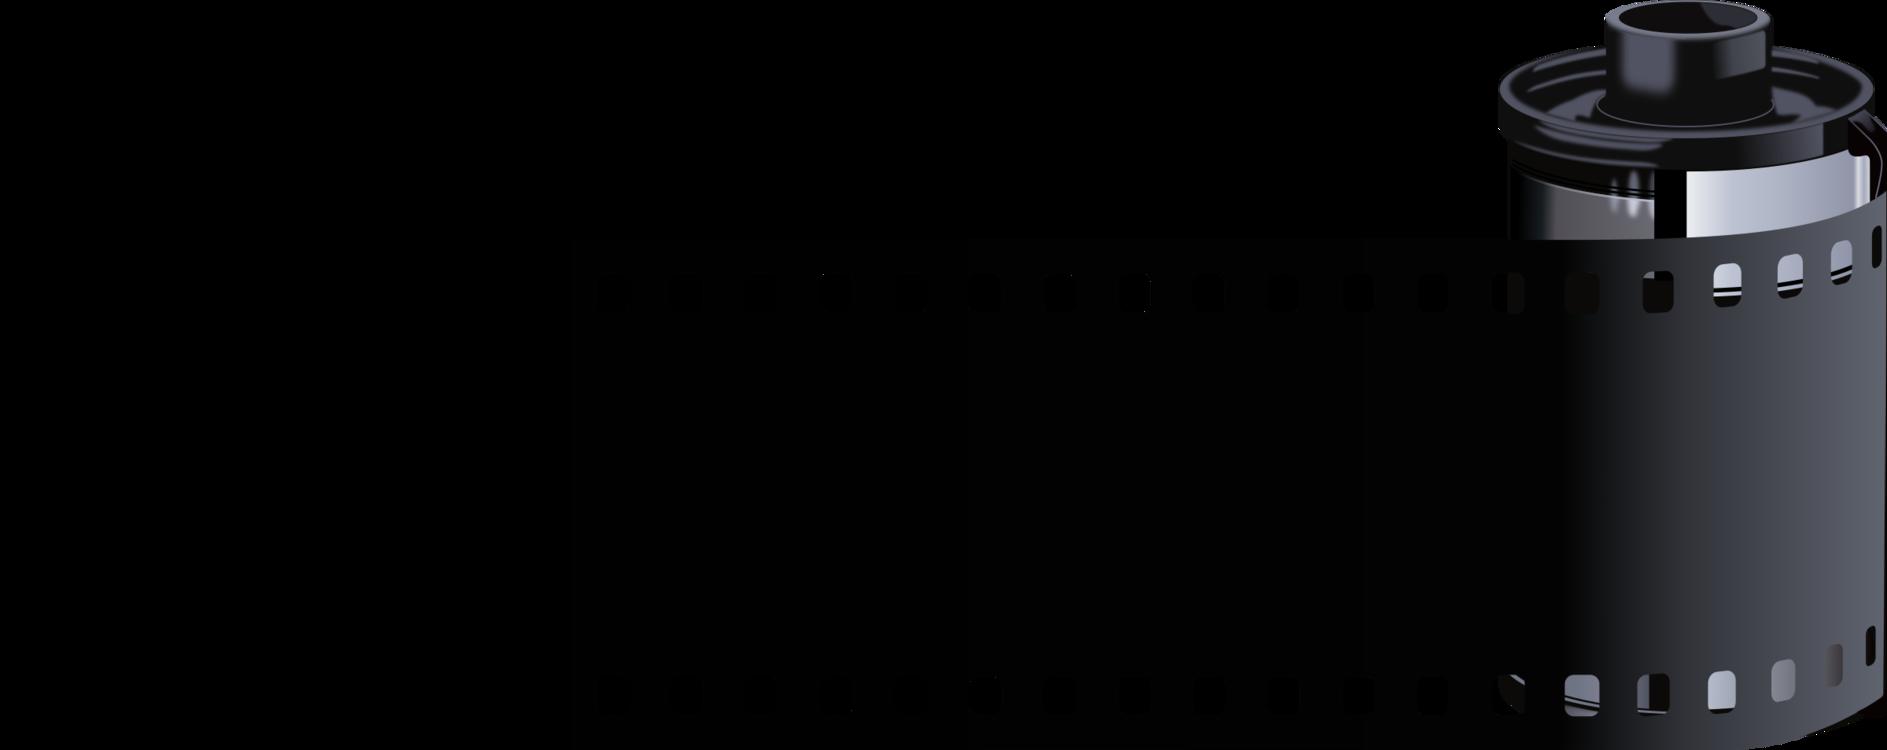 Camera Accessory,Angle,Black And White